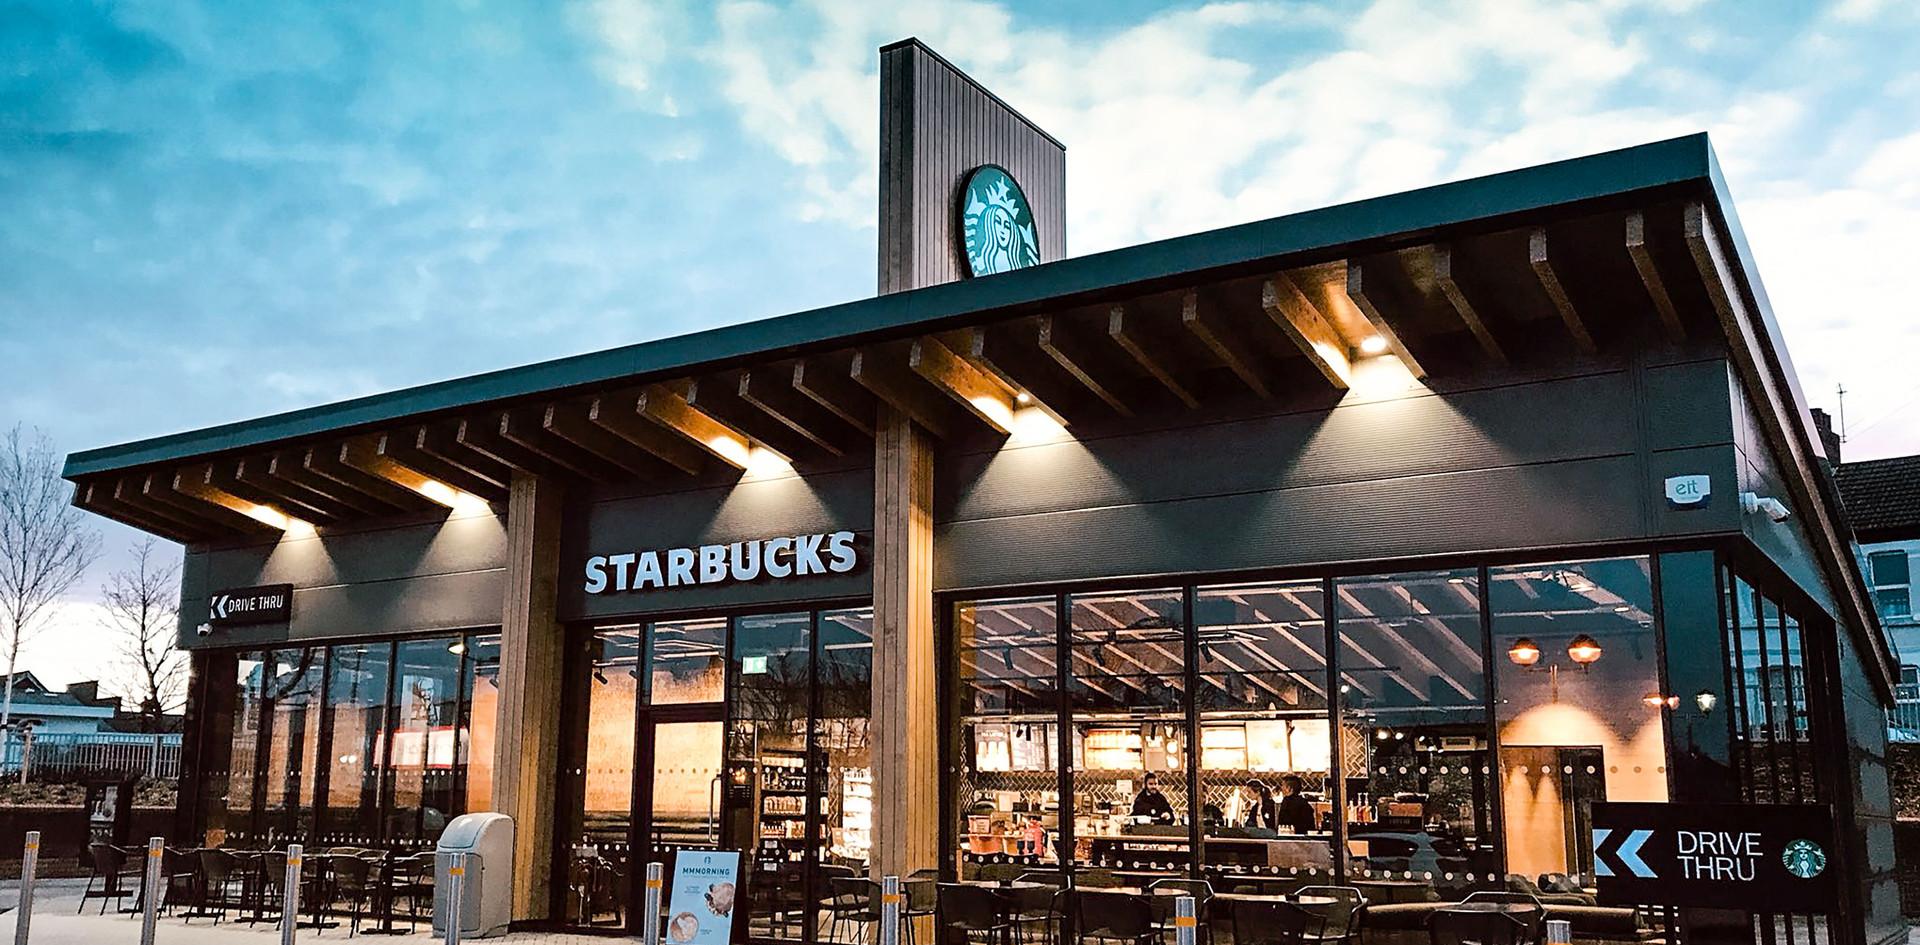 Nis-Signs-Starbucks-Drive-Thru.jpg